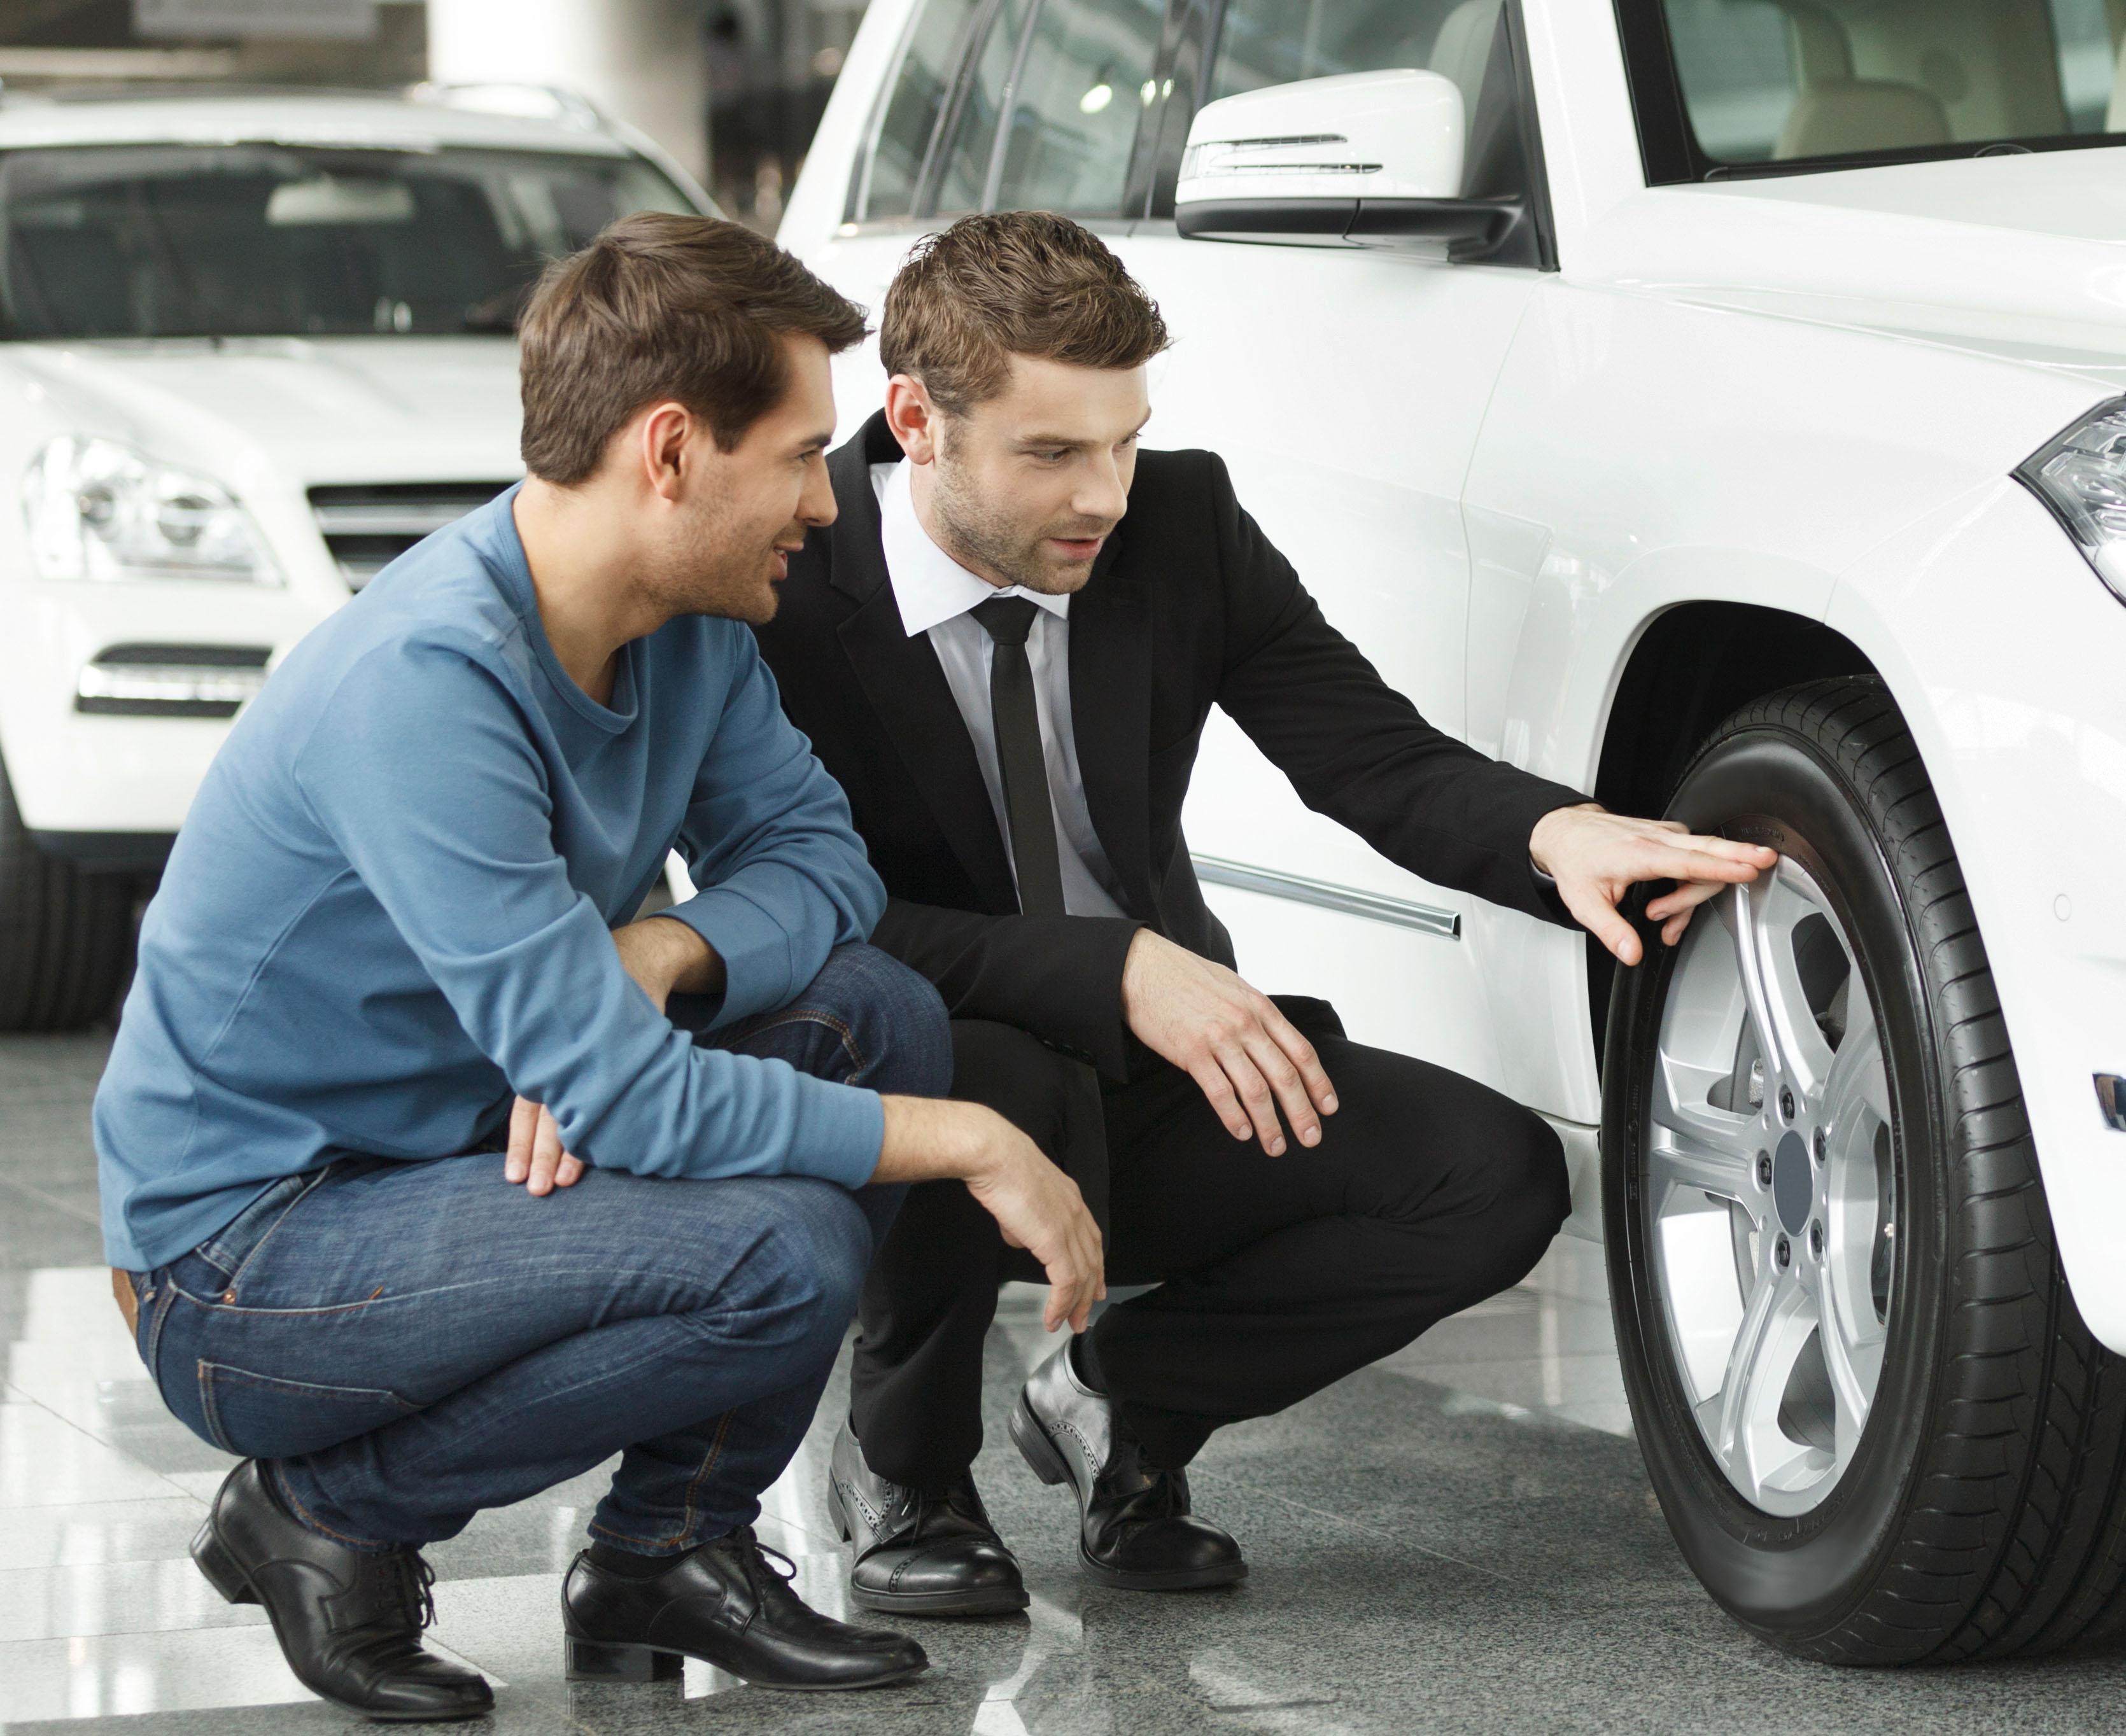 El útil comprador de coches